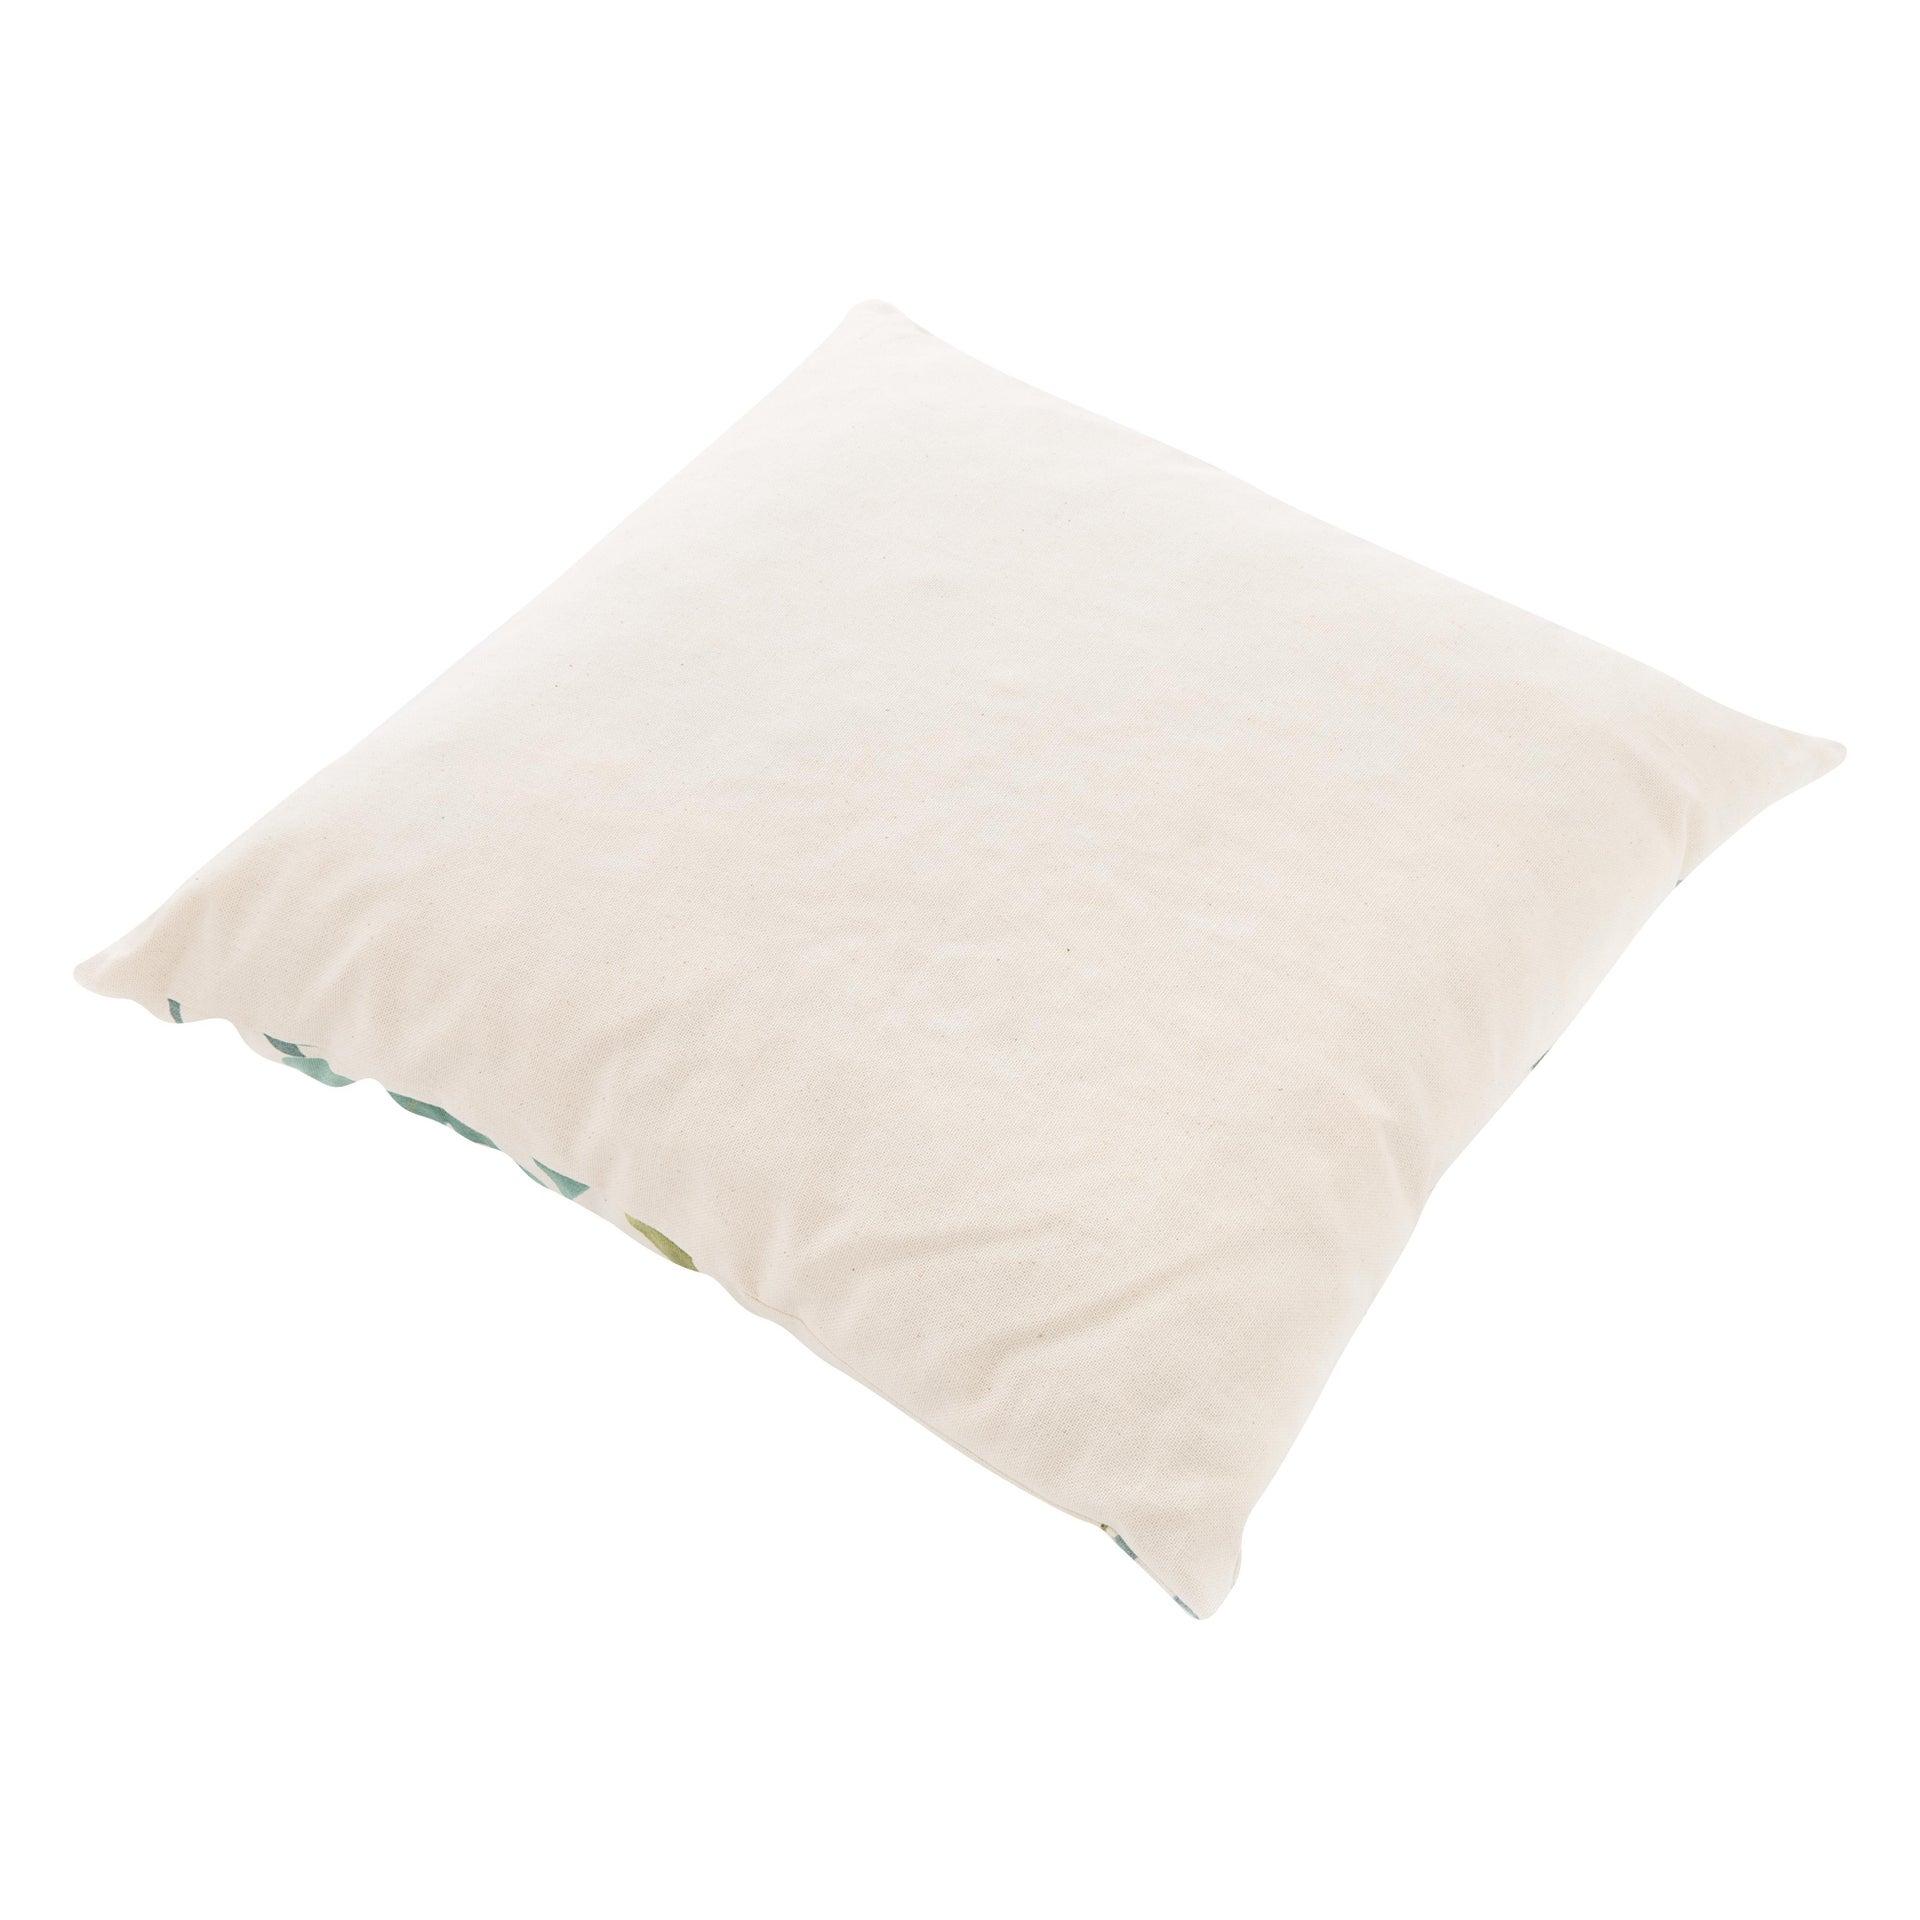 Cuscino da esterno BRASILE multicolore 120 x 80 x Sp 80 cm , 4 pezzi - 4